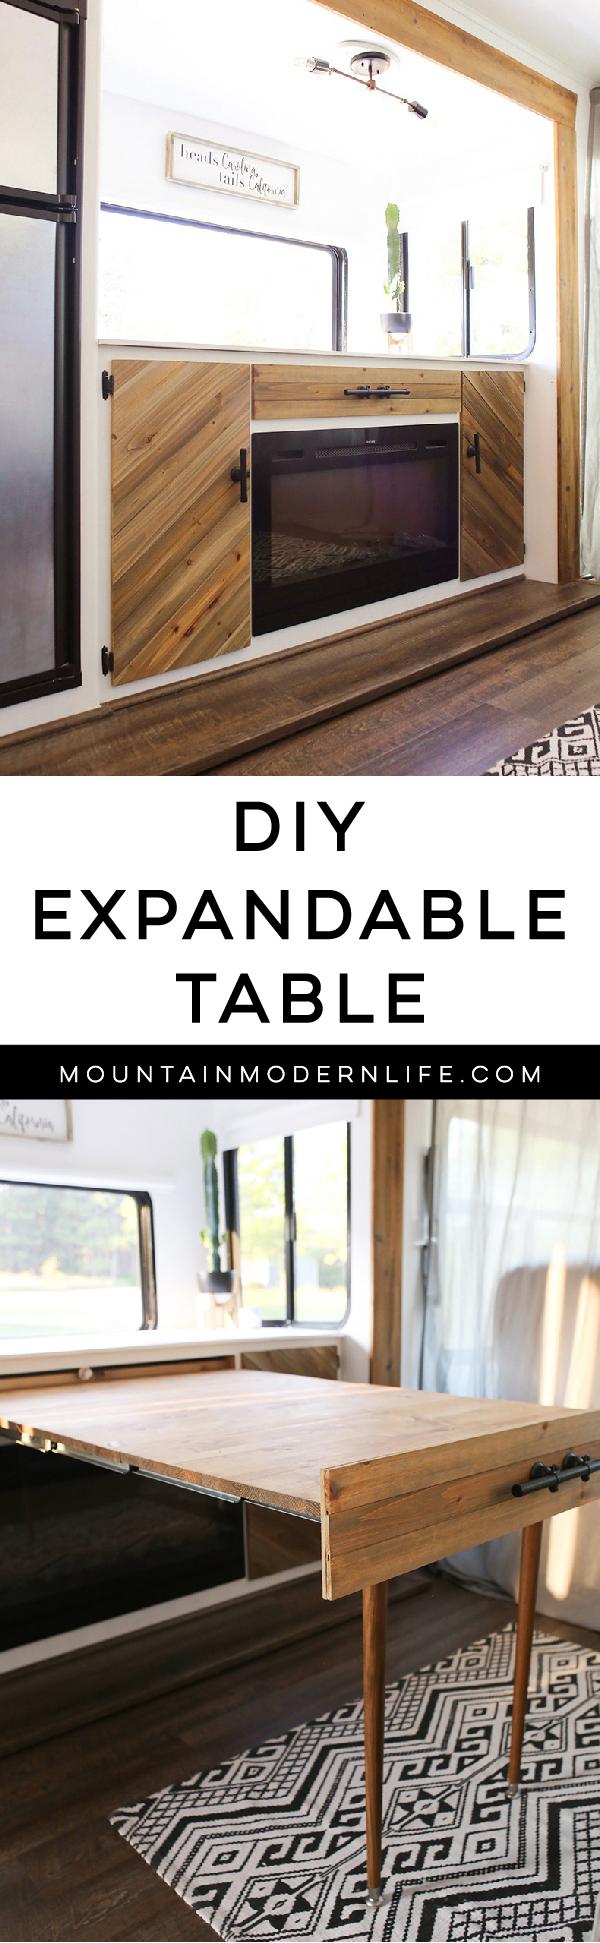 DIY RV table